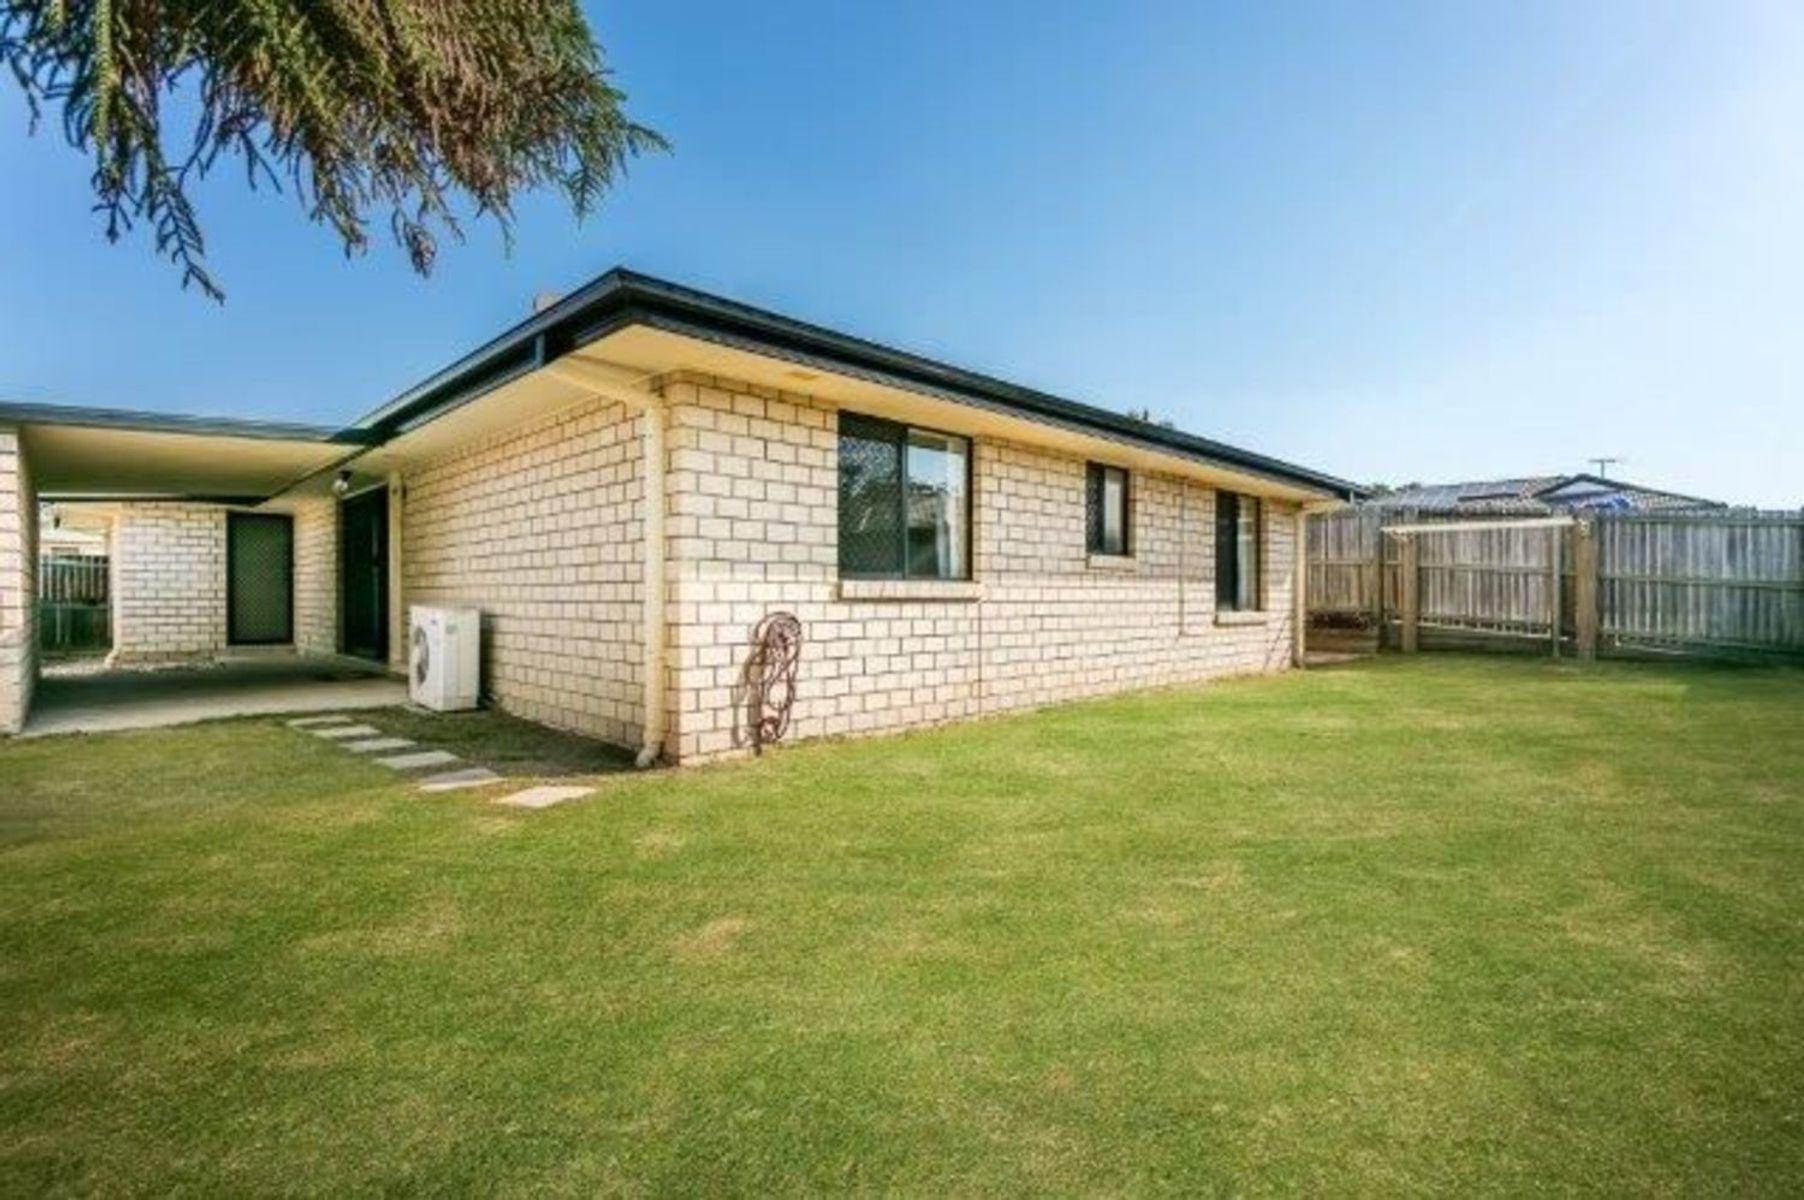 13 Windamere Court, Heritage Park, QLD 4118